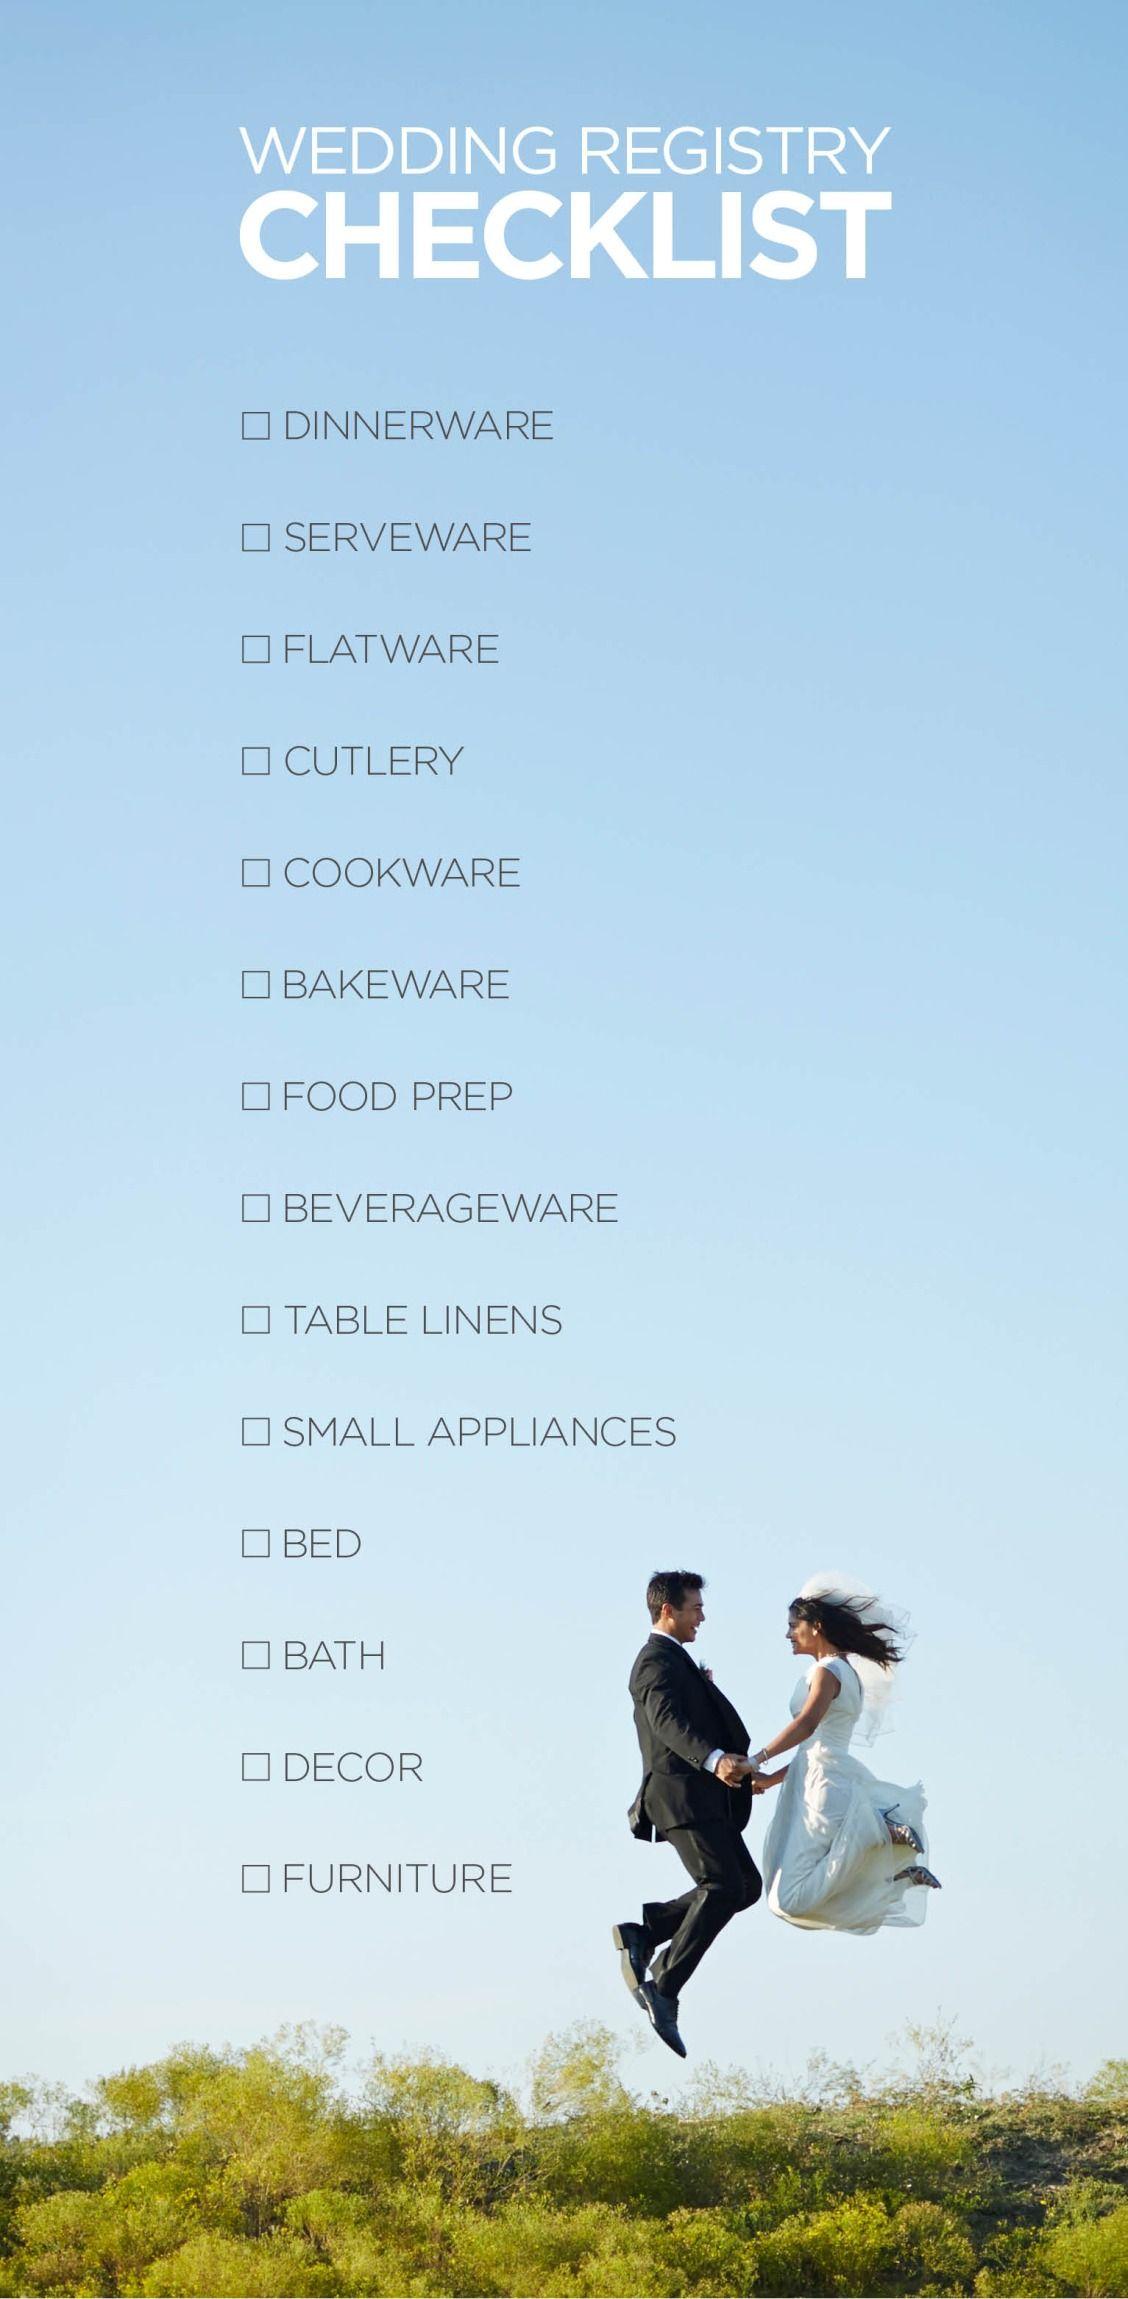 Creating a wedding registry that is organized, thorough